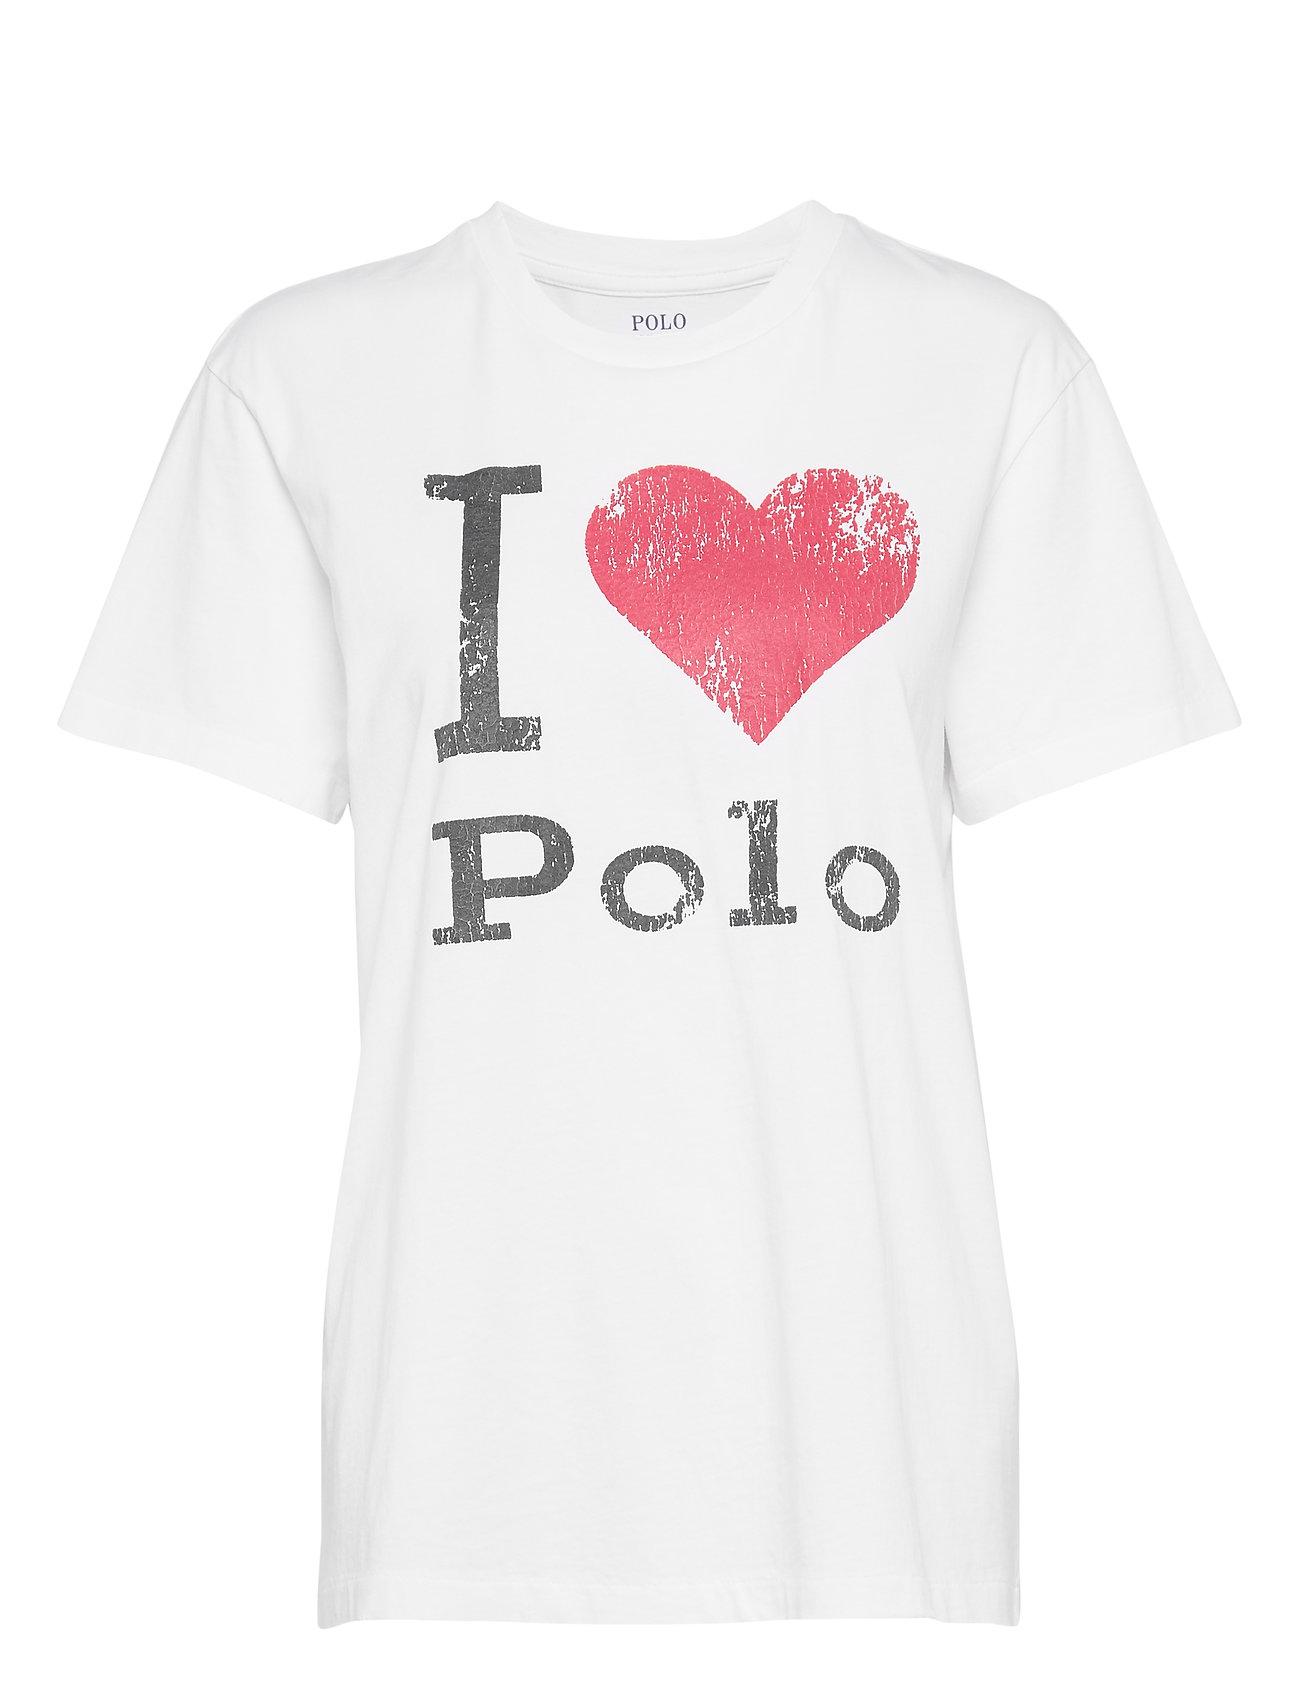 Polo Ralph Lauren Jersey Polo Graphic Tee